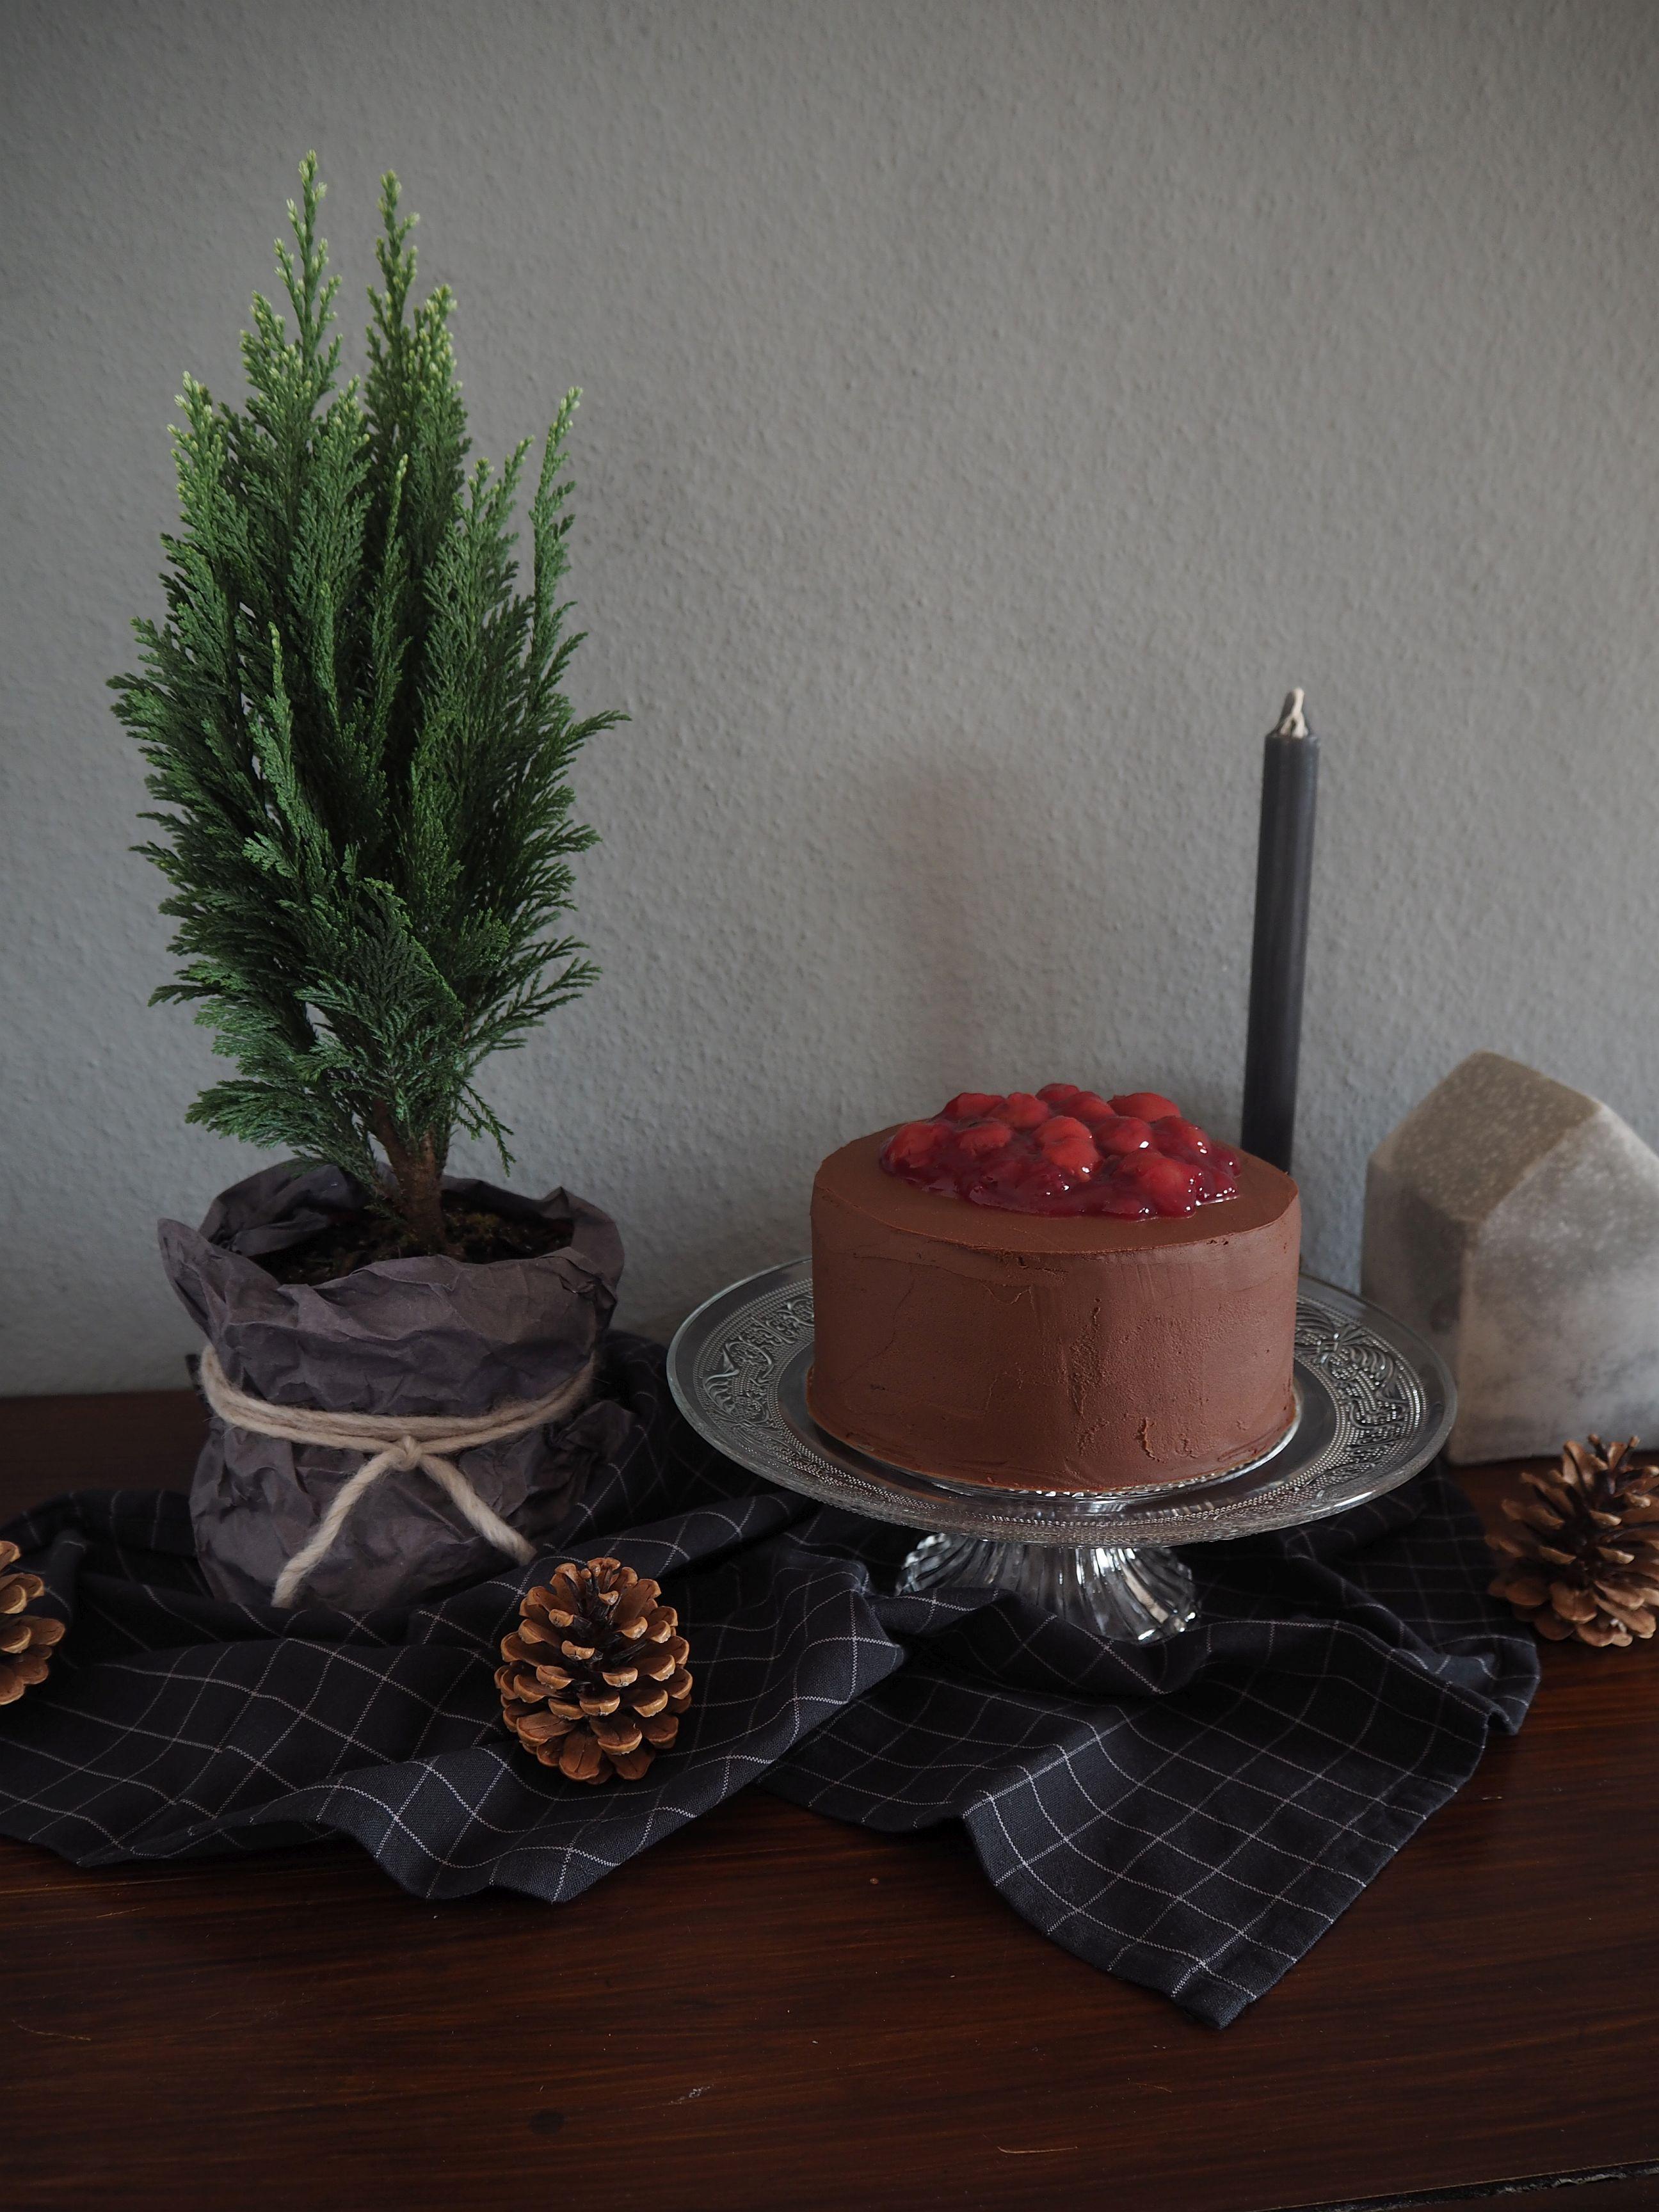 2017-12-skoen-och-kreativ-adventskalender-cookie-and-cake-love-chocolate-cherry-cake (4)